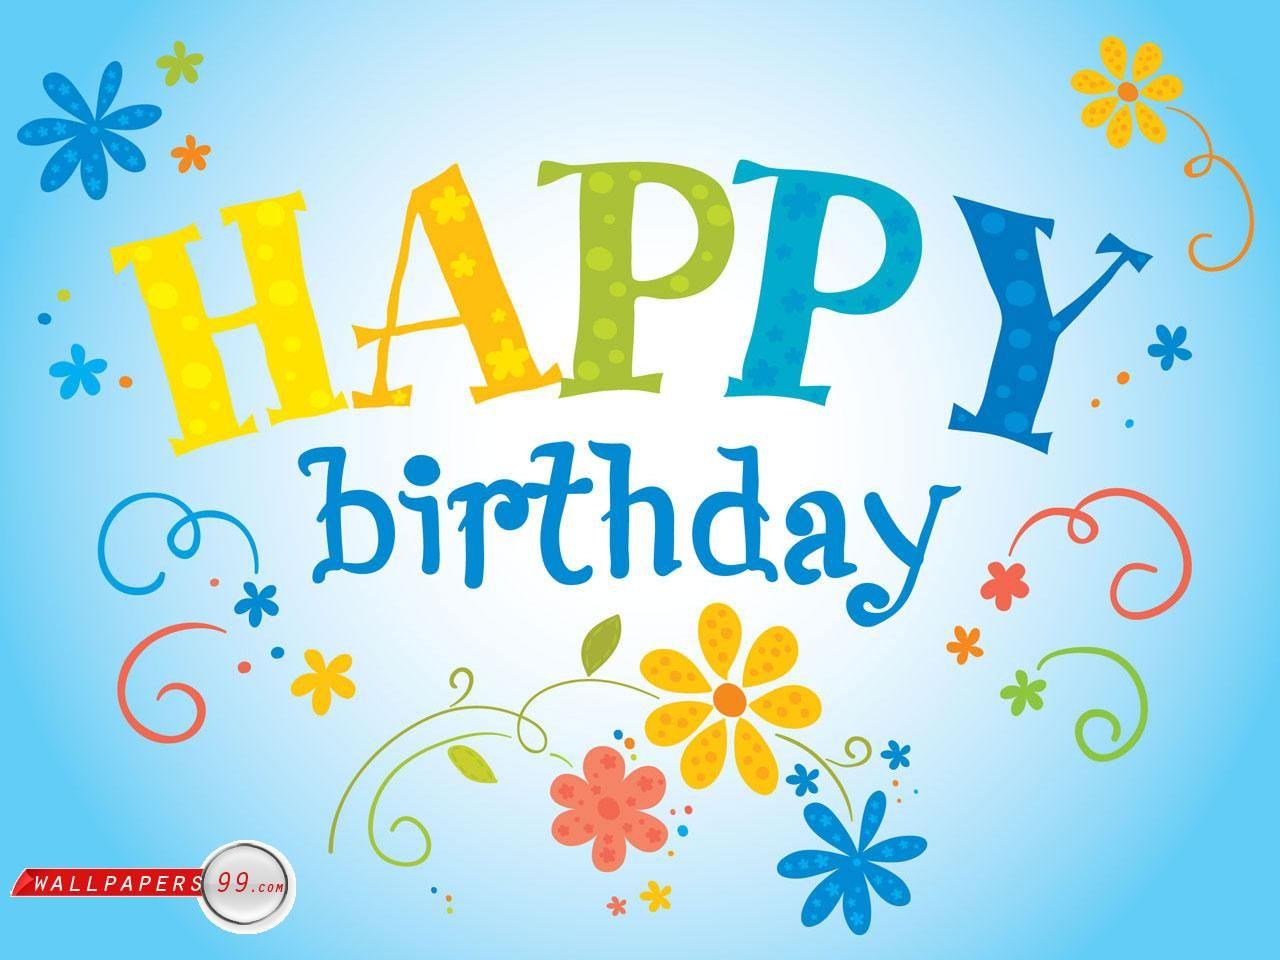 Happy Birthday Wallpaper Picture Image 1280x960 35668